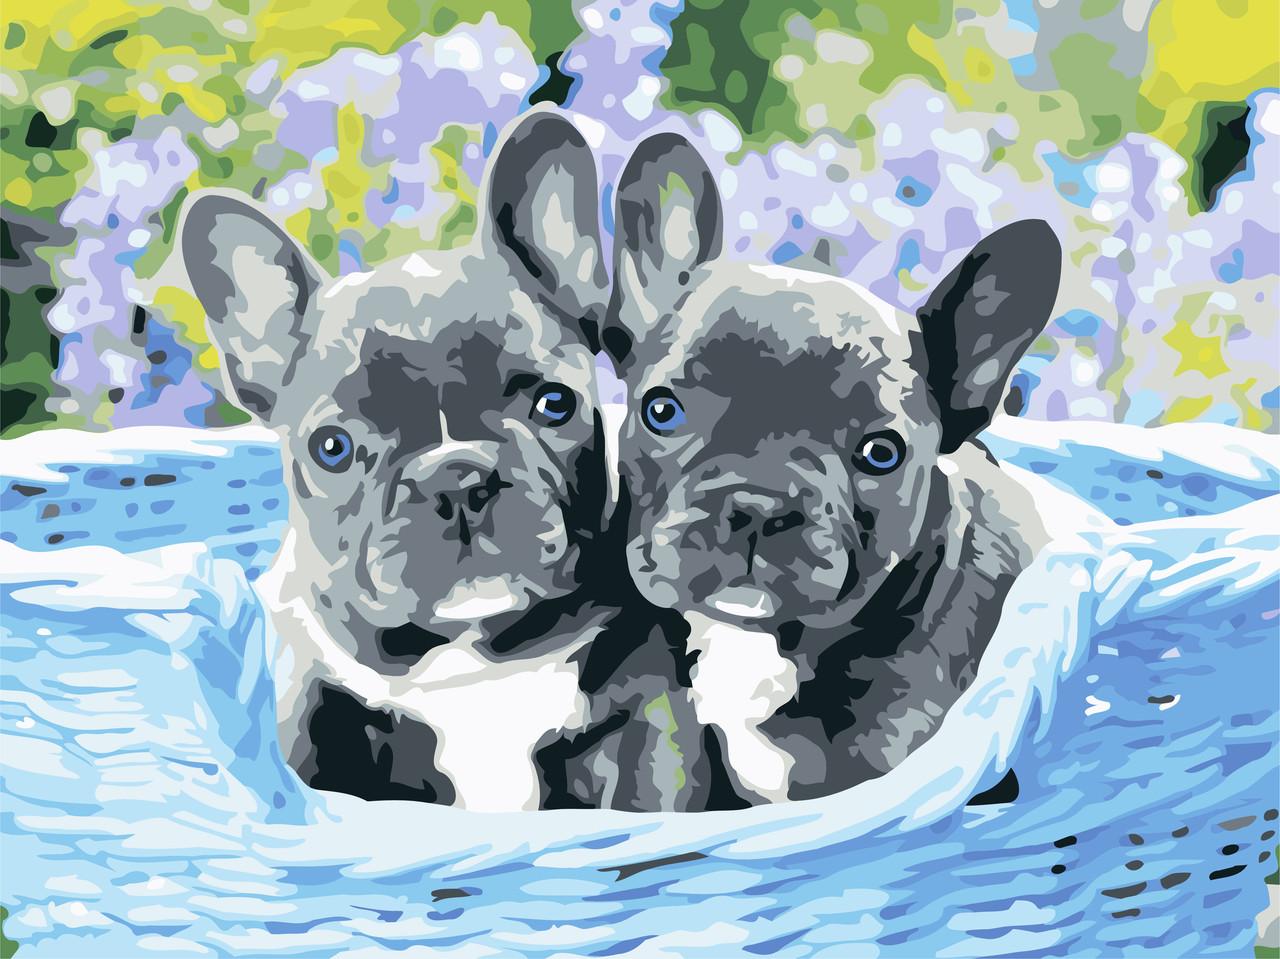 Картина по номерам Два пёсика ArtStory AS0596 30 х 40 см (без коробки)